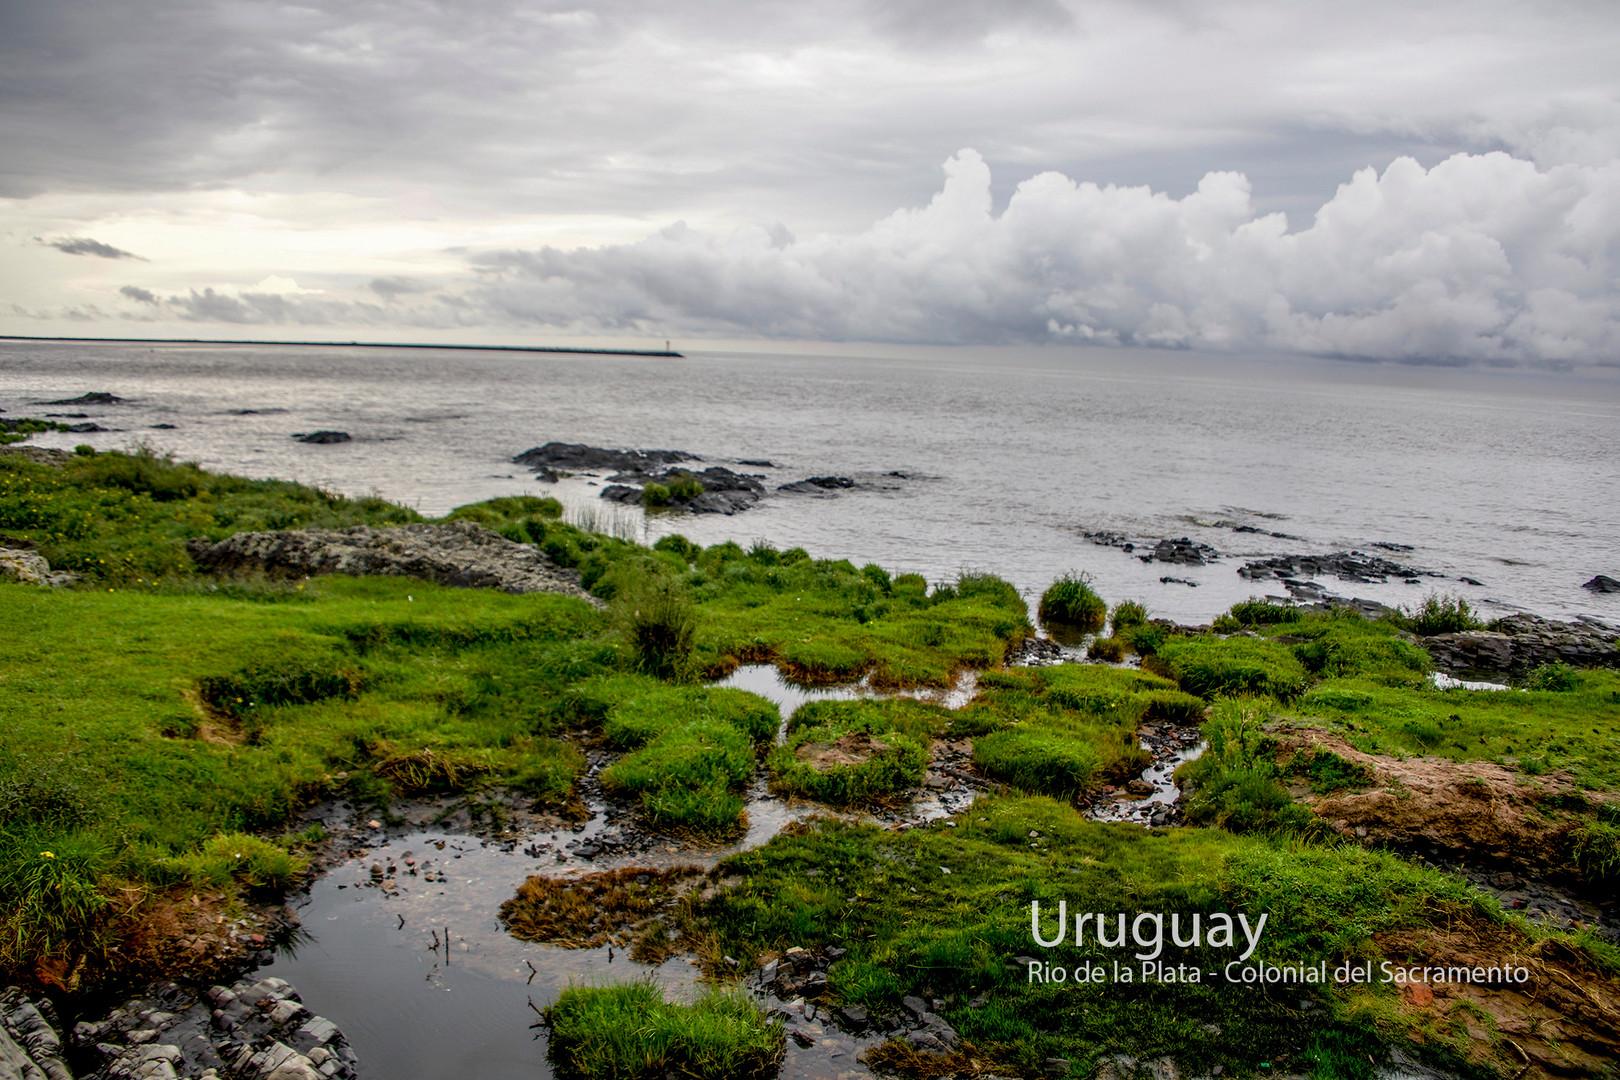 2019-02-23 URUGUAY POW (31) 452A5749.jpg